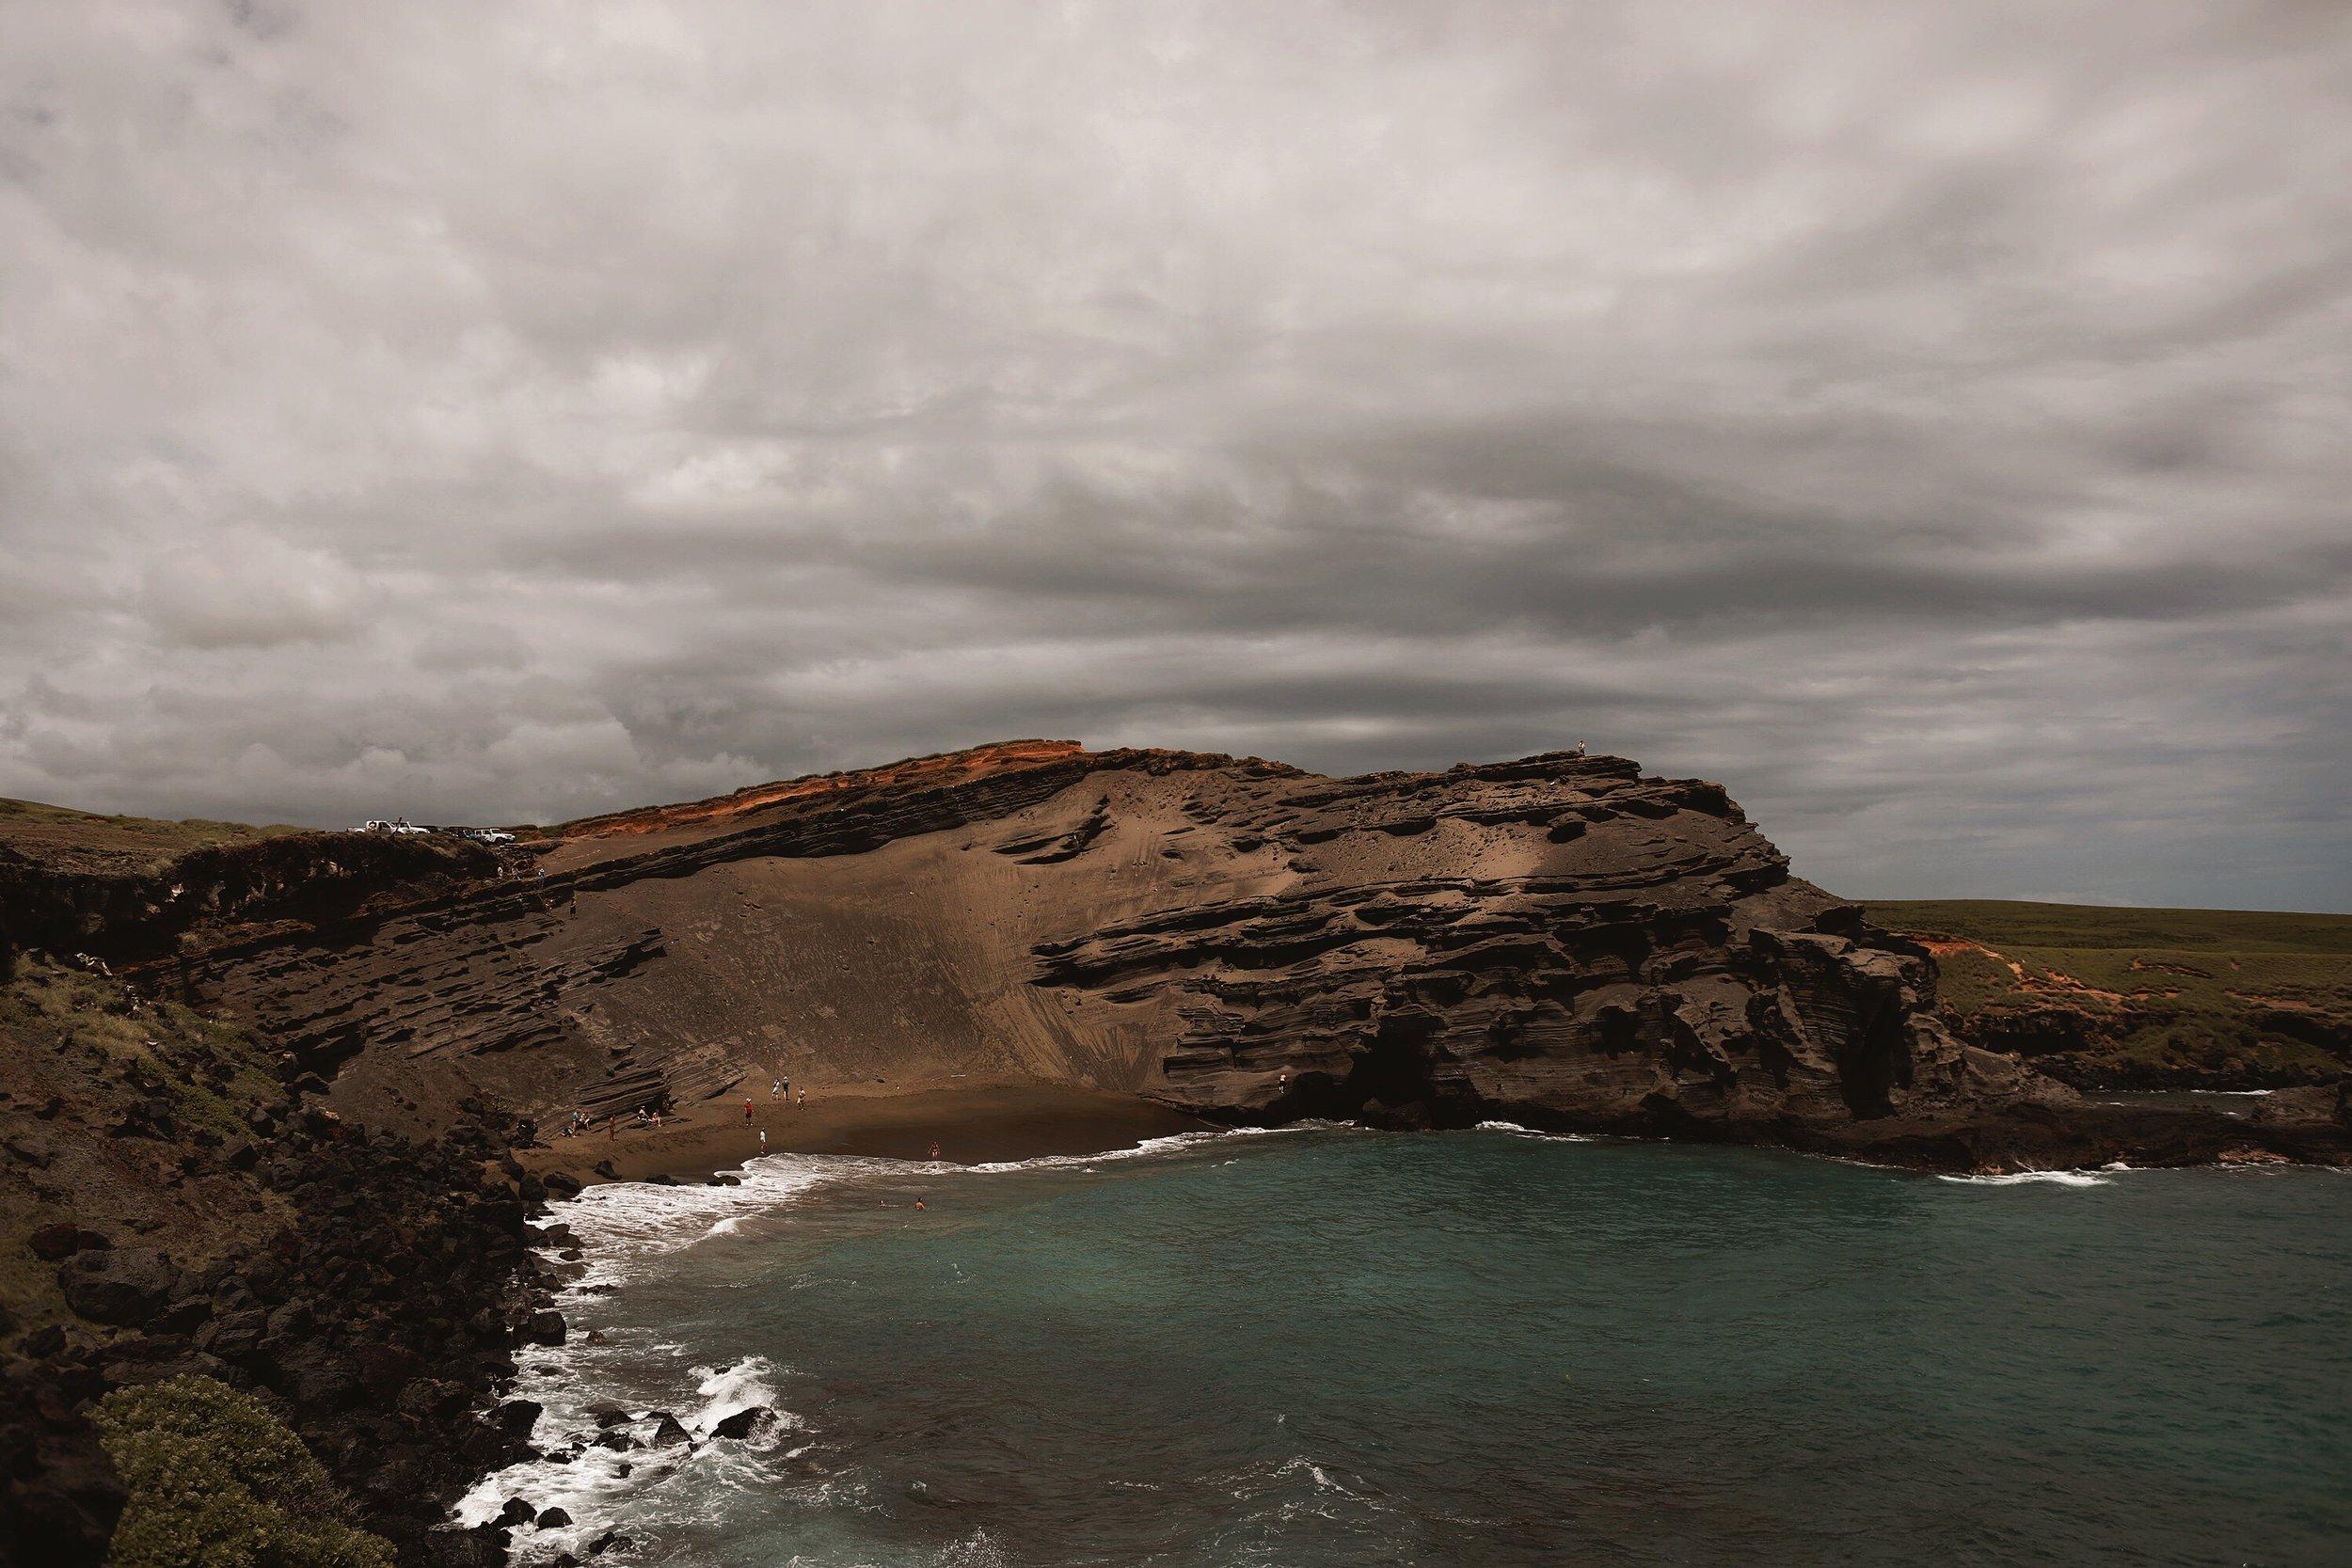 Papakōlea: The Green Sand Beach | Big Island, Hawaii | Travel Wanderlust Blog Hiking | And Away We Went